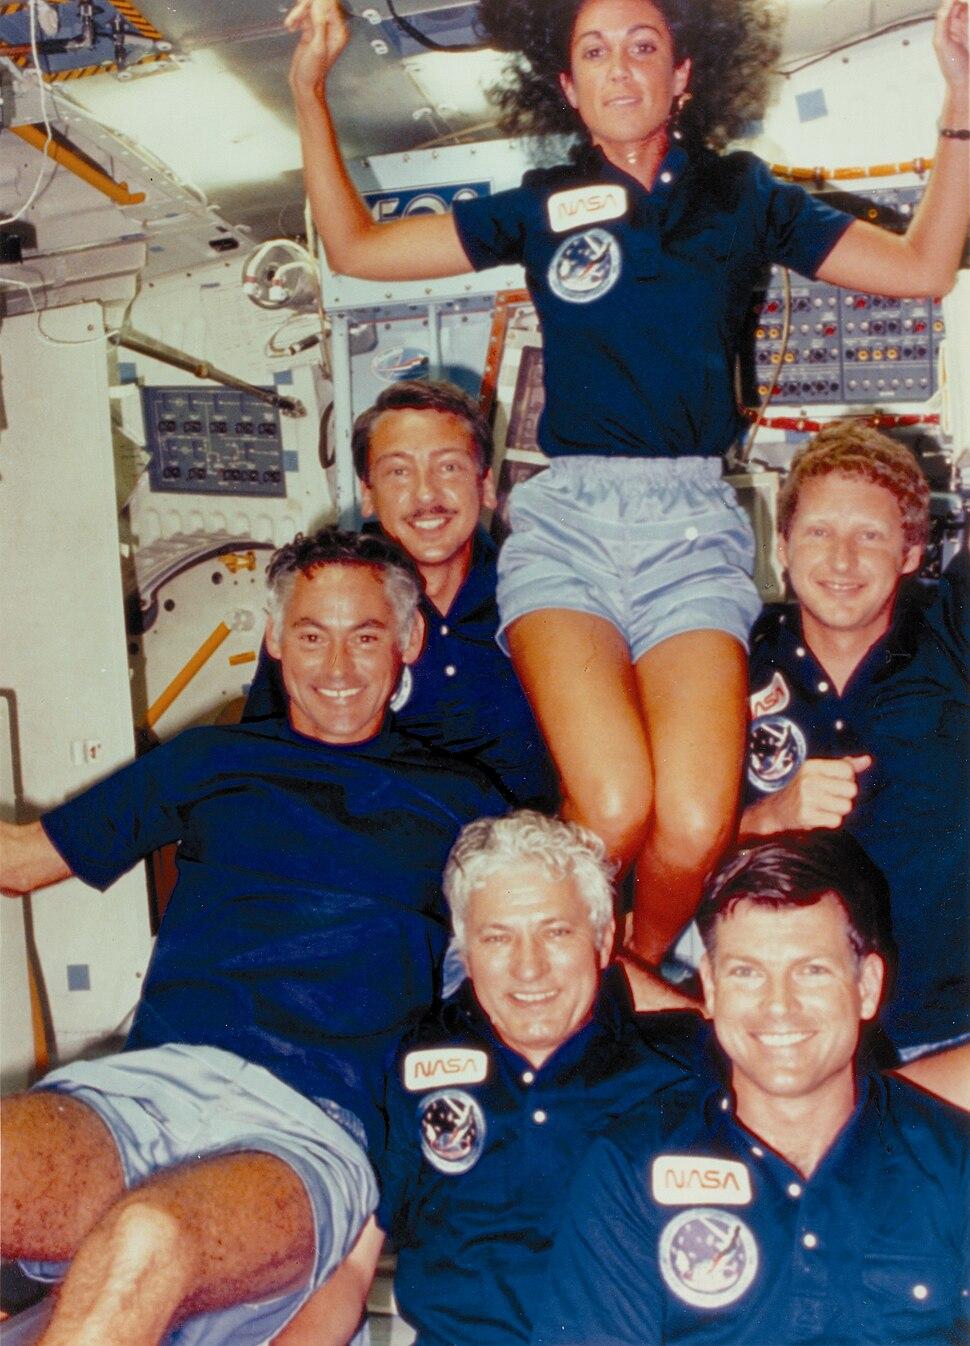 STS-41-D Crew Enjoying Space - GPN-2004-00024